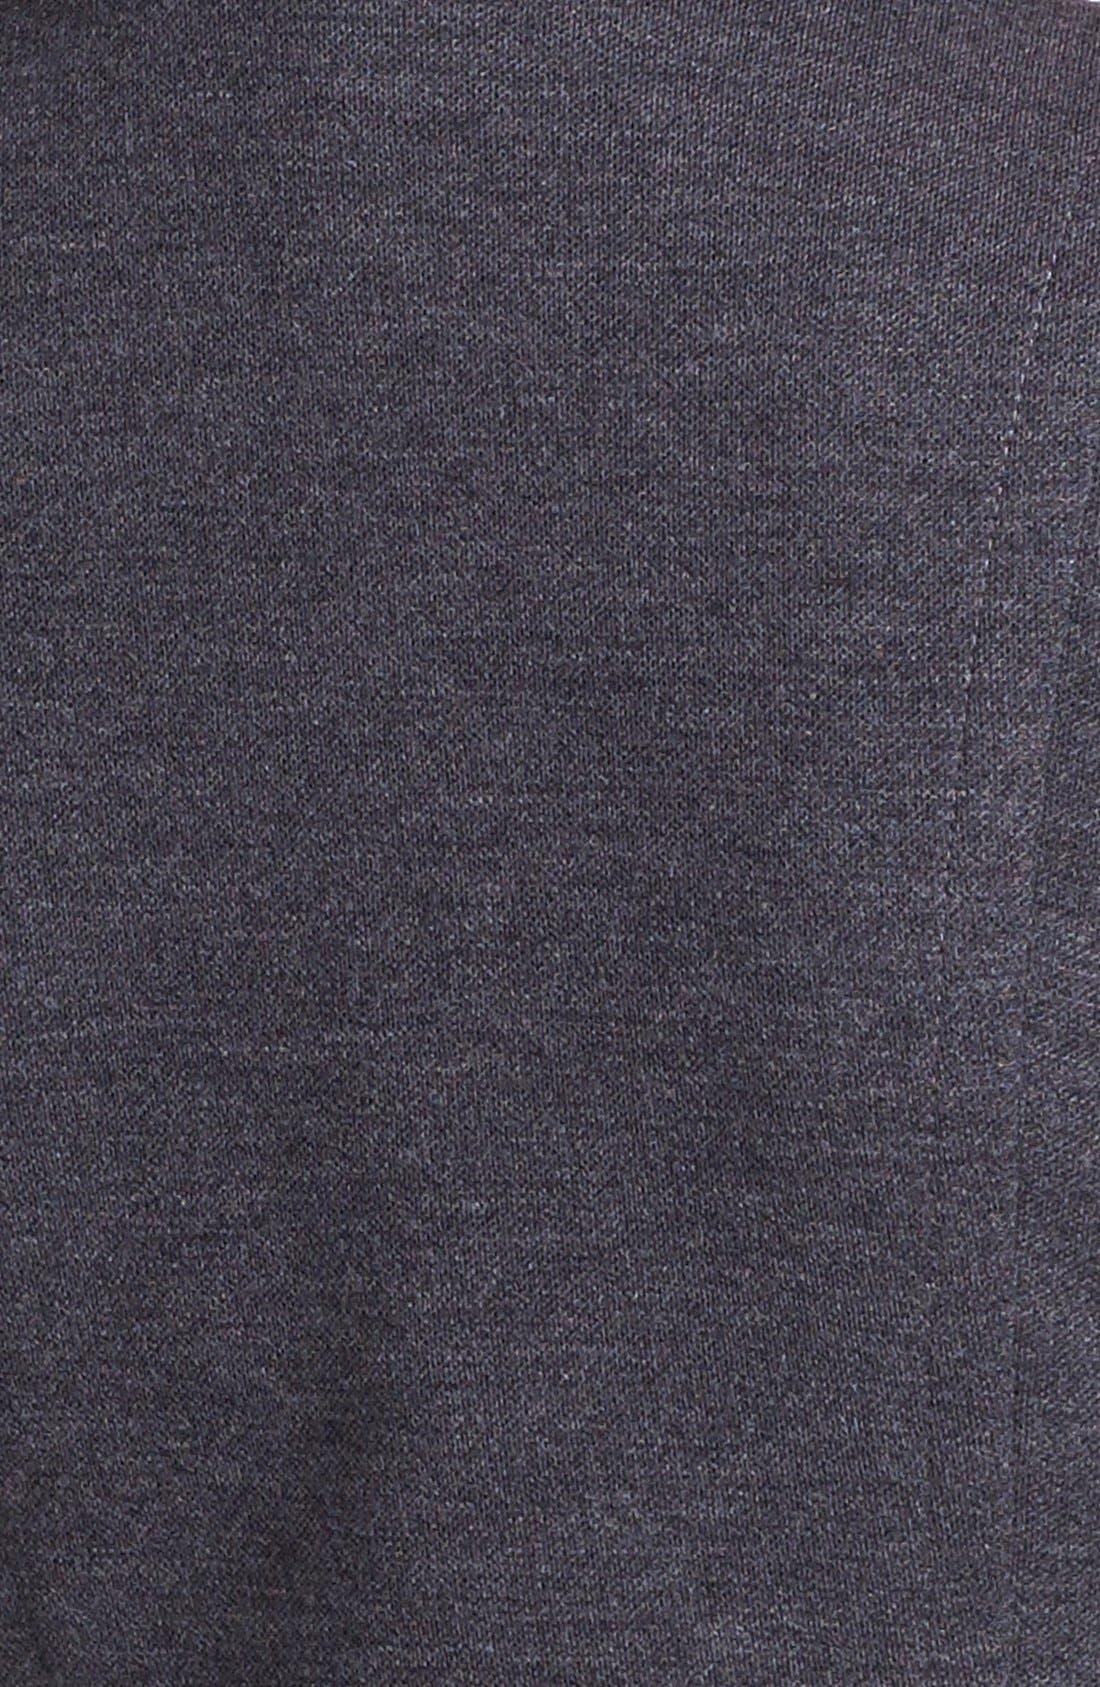 'Milly Milano' Jacket,                             Alternate thumbnail 3, color,                             020